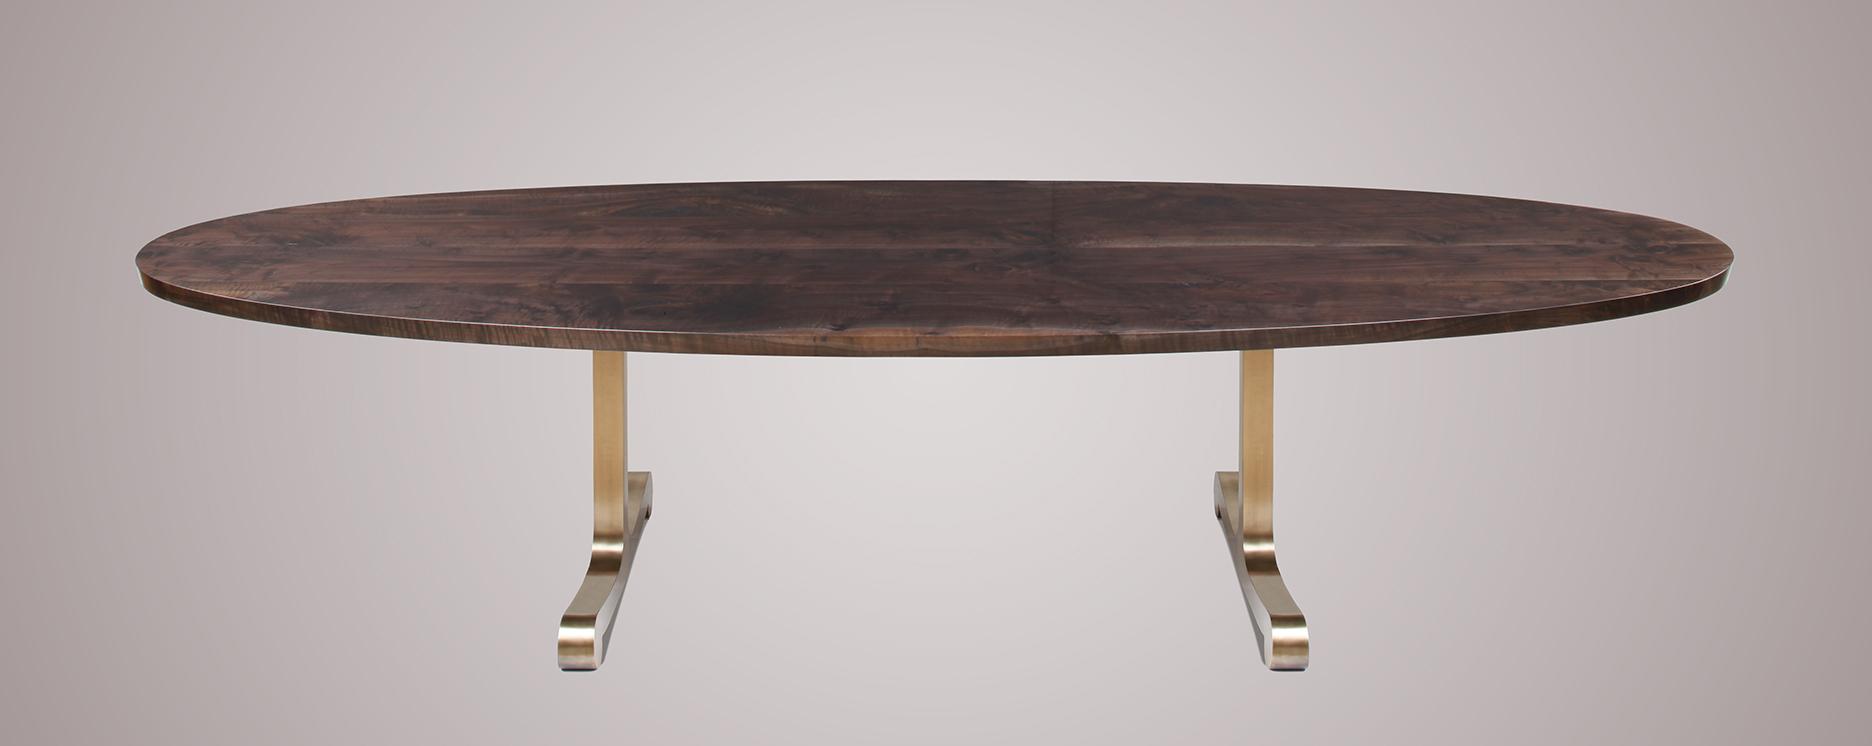 Oval walnut dining table